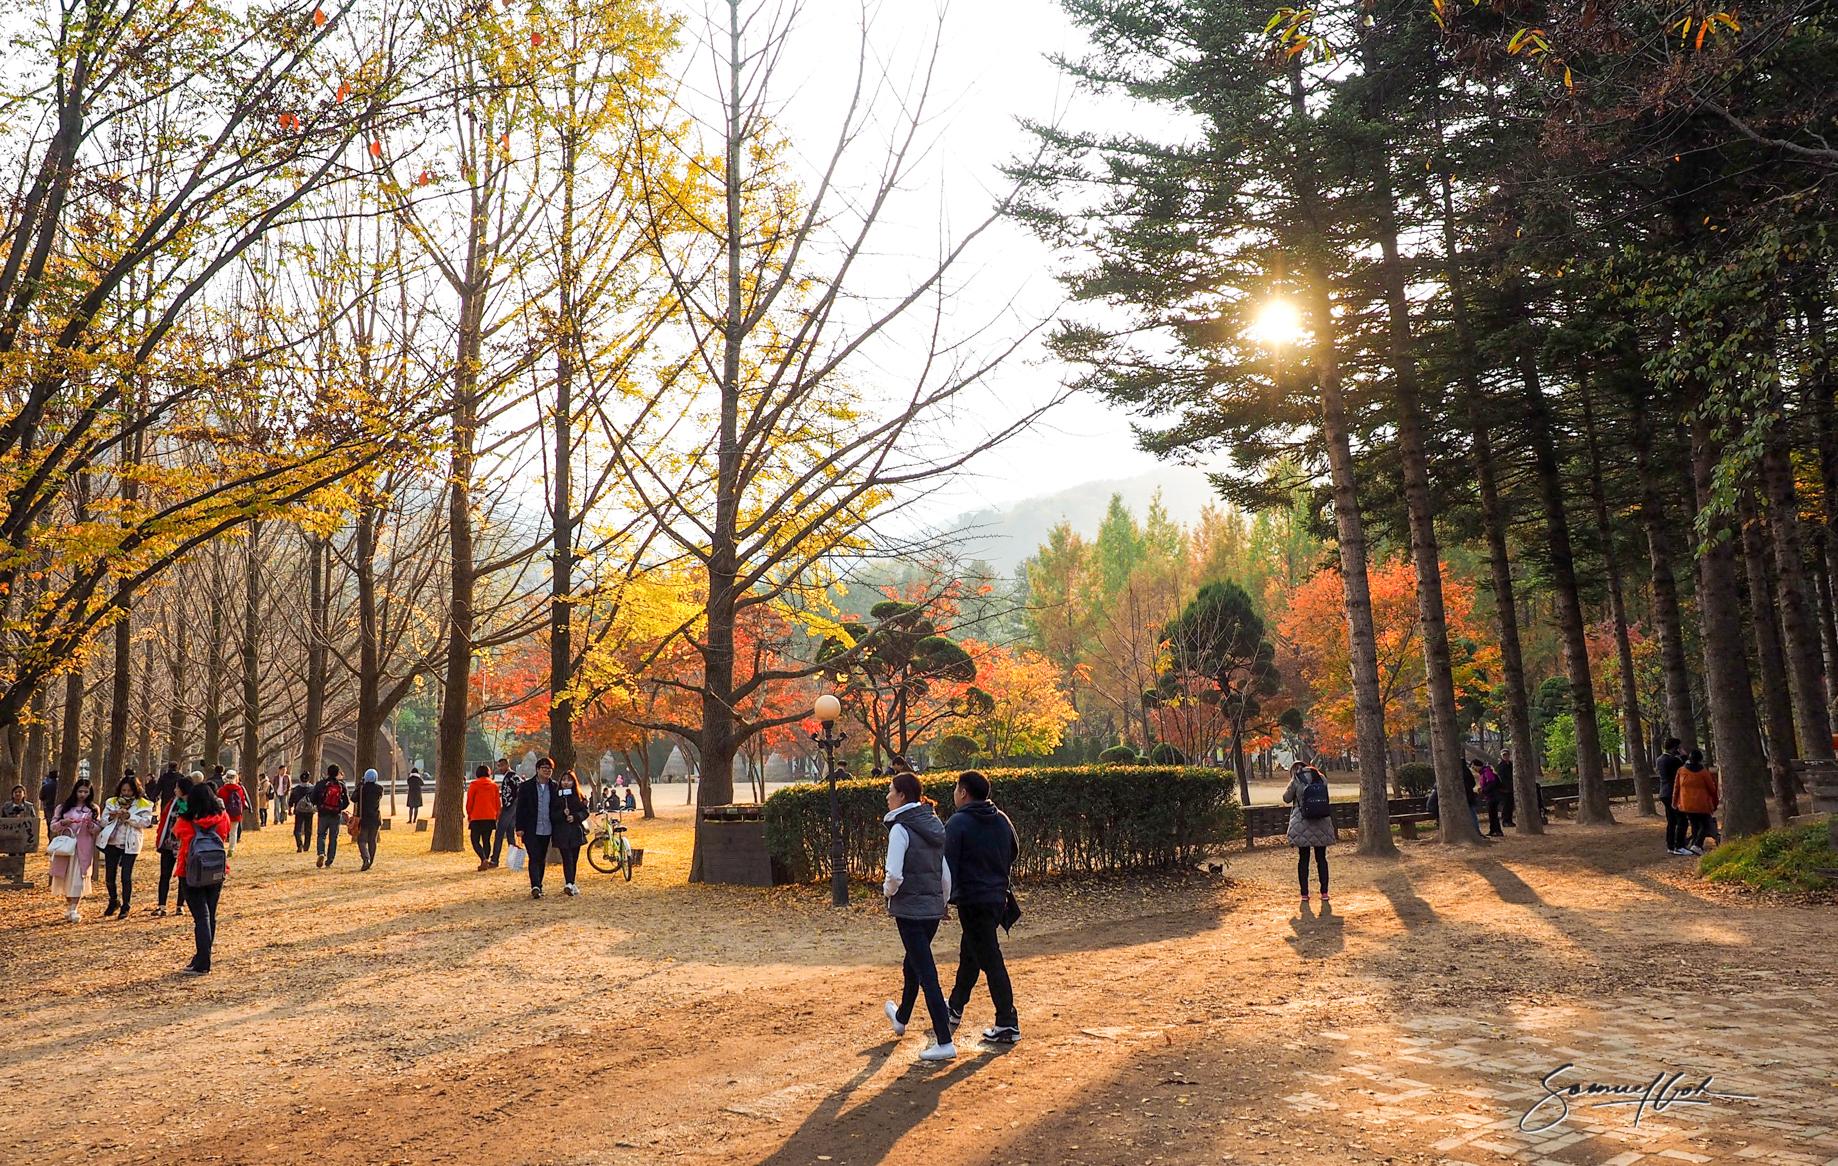 Nami Island, Seoul, South Korea